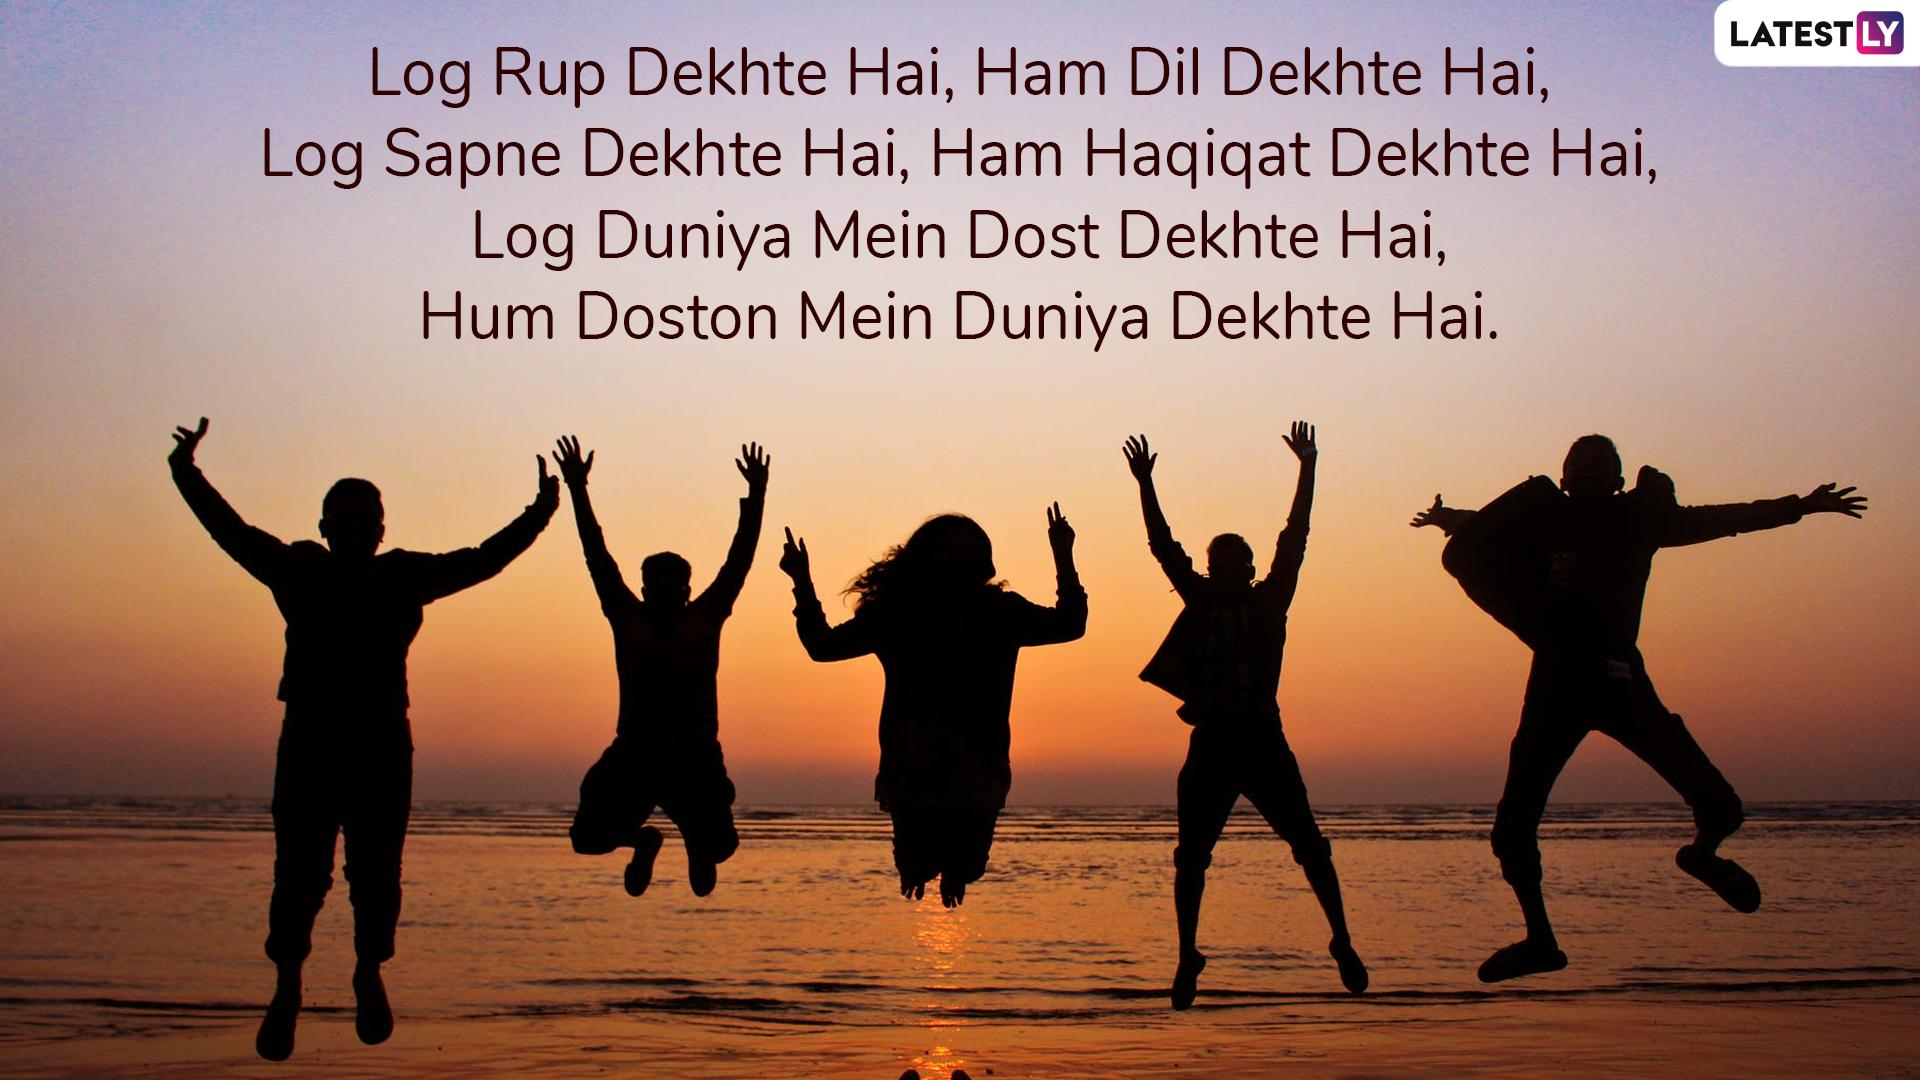 Friendship Day 2019 Hindi Wishes in Advance: WhatsApp ...